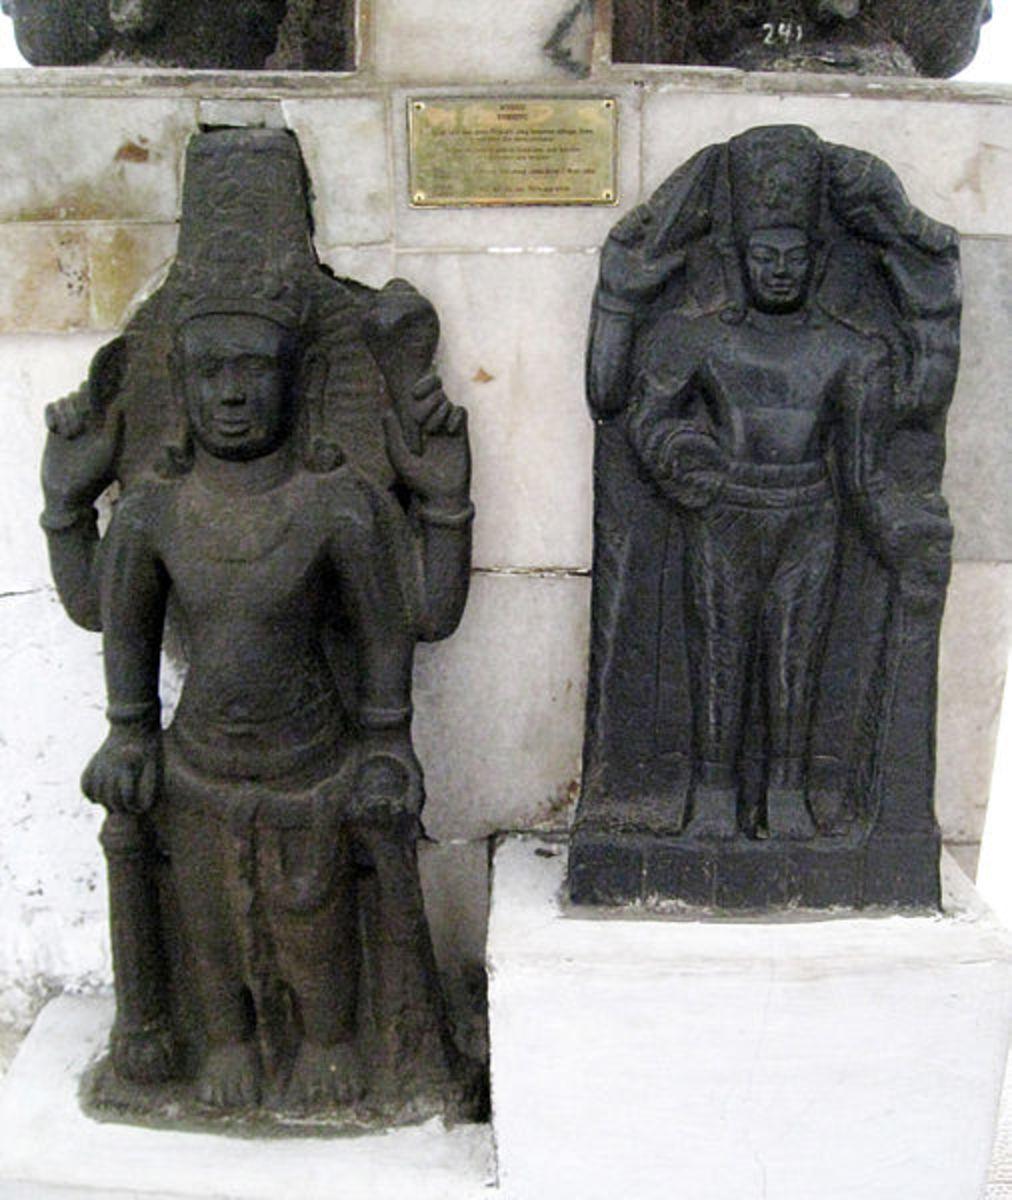 Two Vishnu statues from Cibuaya, Karawang, West Java. Tarumanagara c. 7th-8th century CE. The tubular crown bears similarities with Cambodian Khmer art.